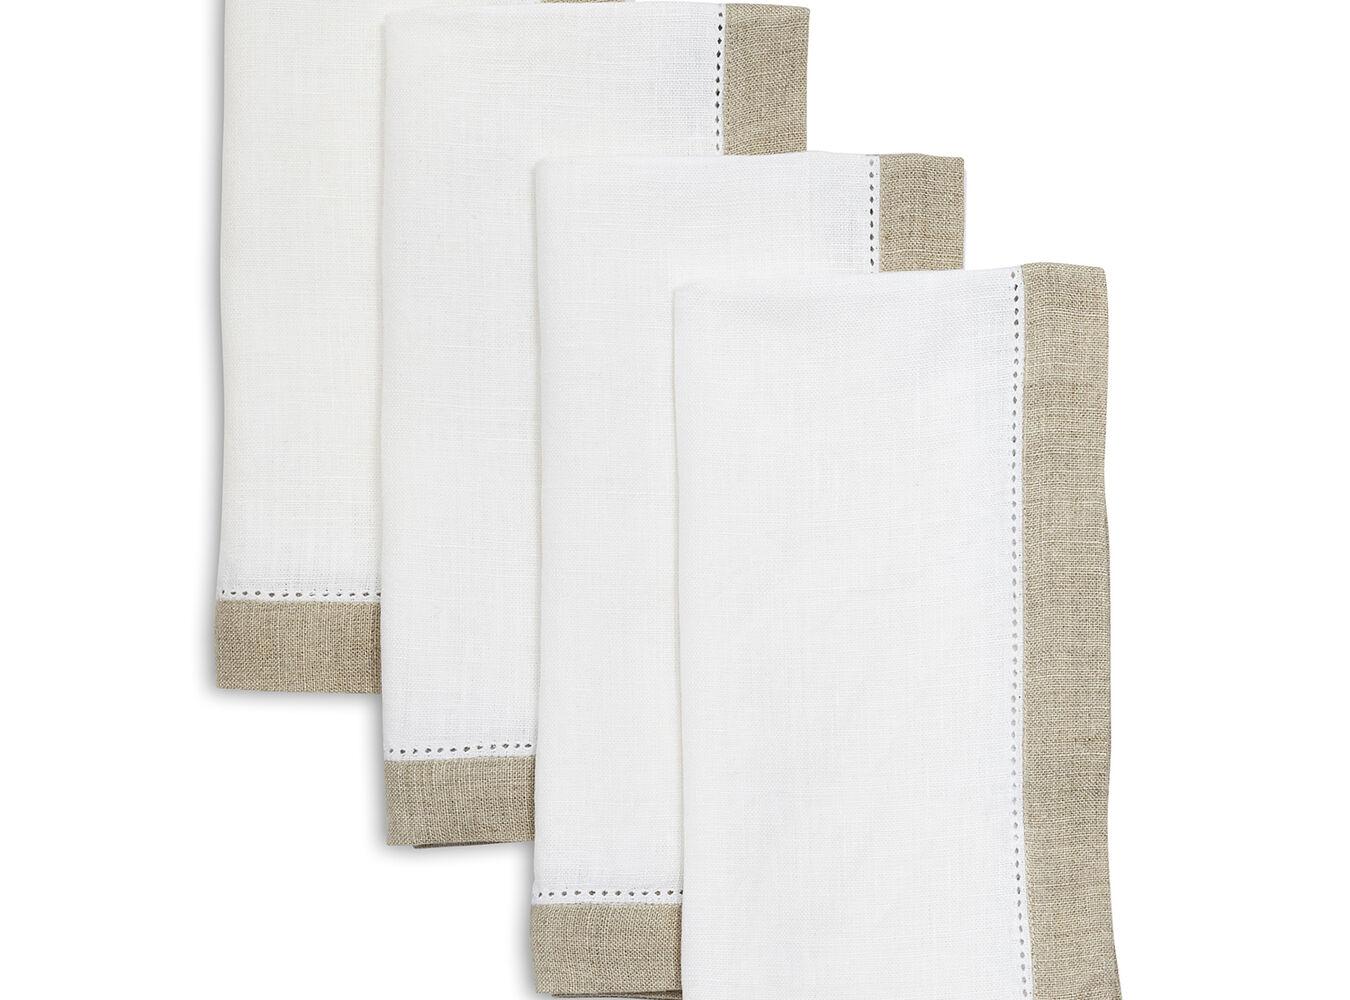 Hemstitch-Border Linen Napkins, Set of 4 | Sur La Table